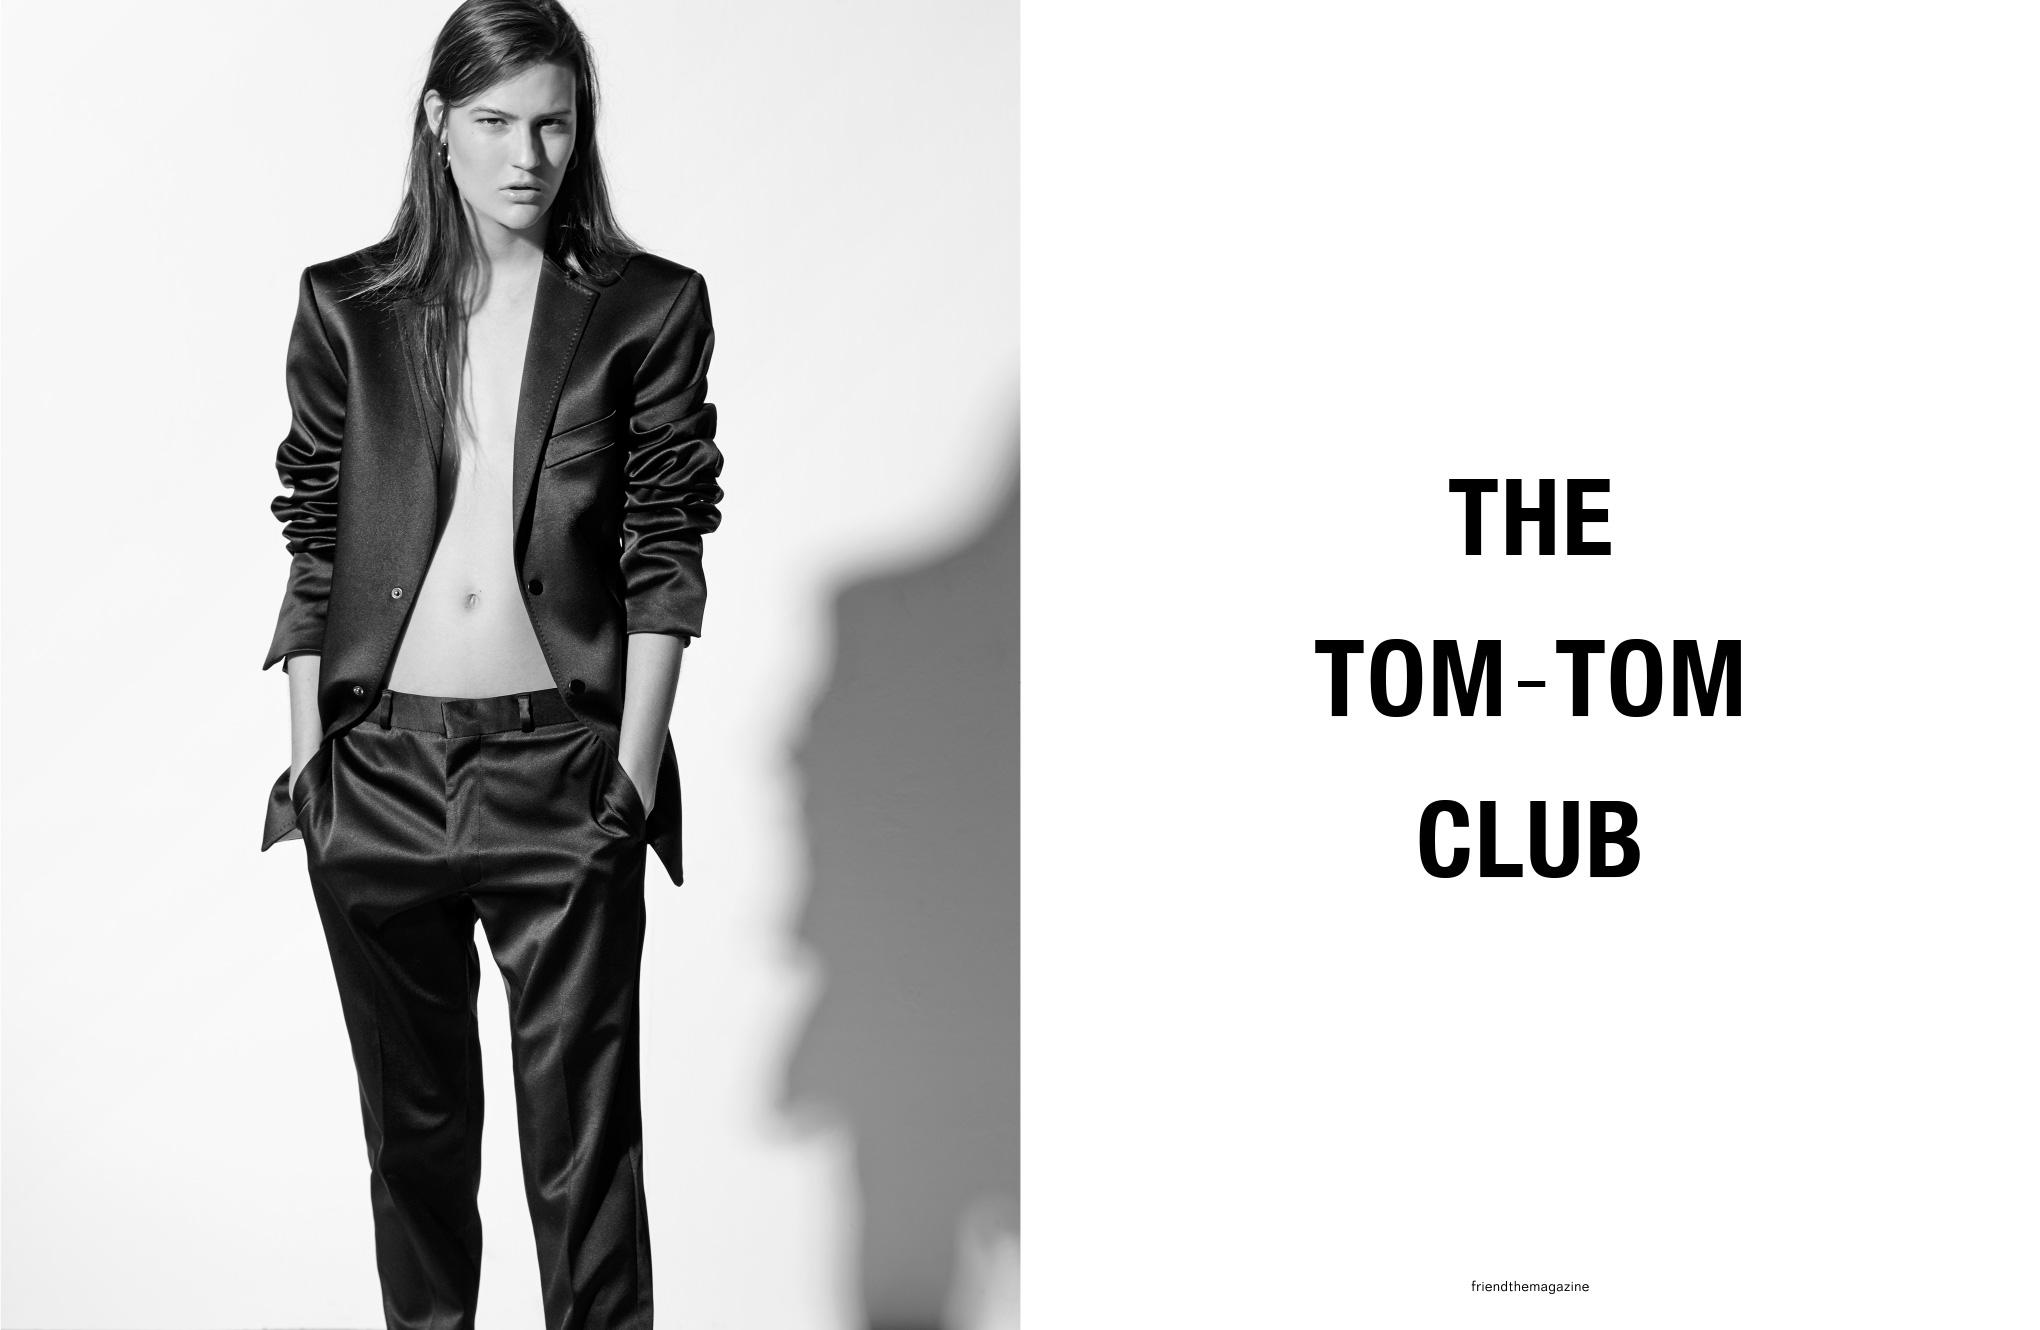 friend-tom-tom-club-max-doyle-ilona-hamer-edit-v14-1330px-high-1-1.jpg